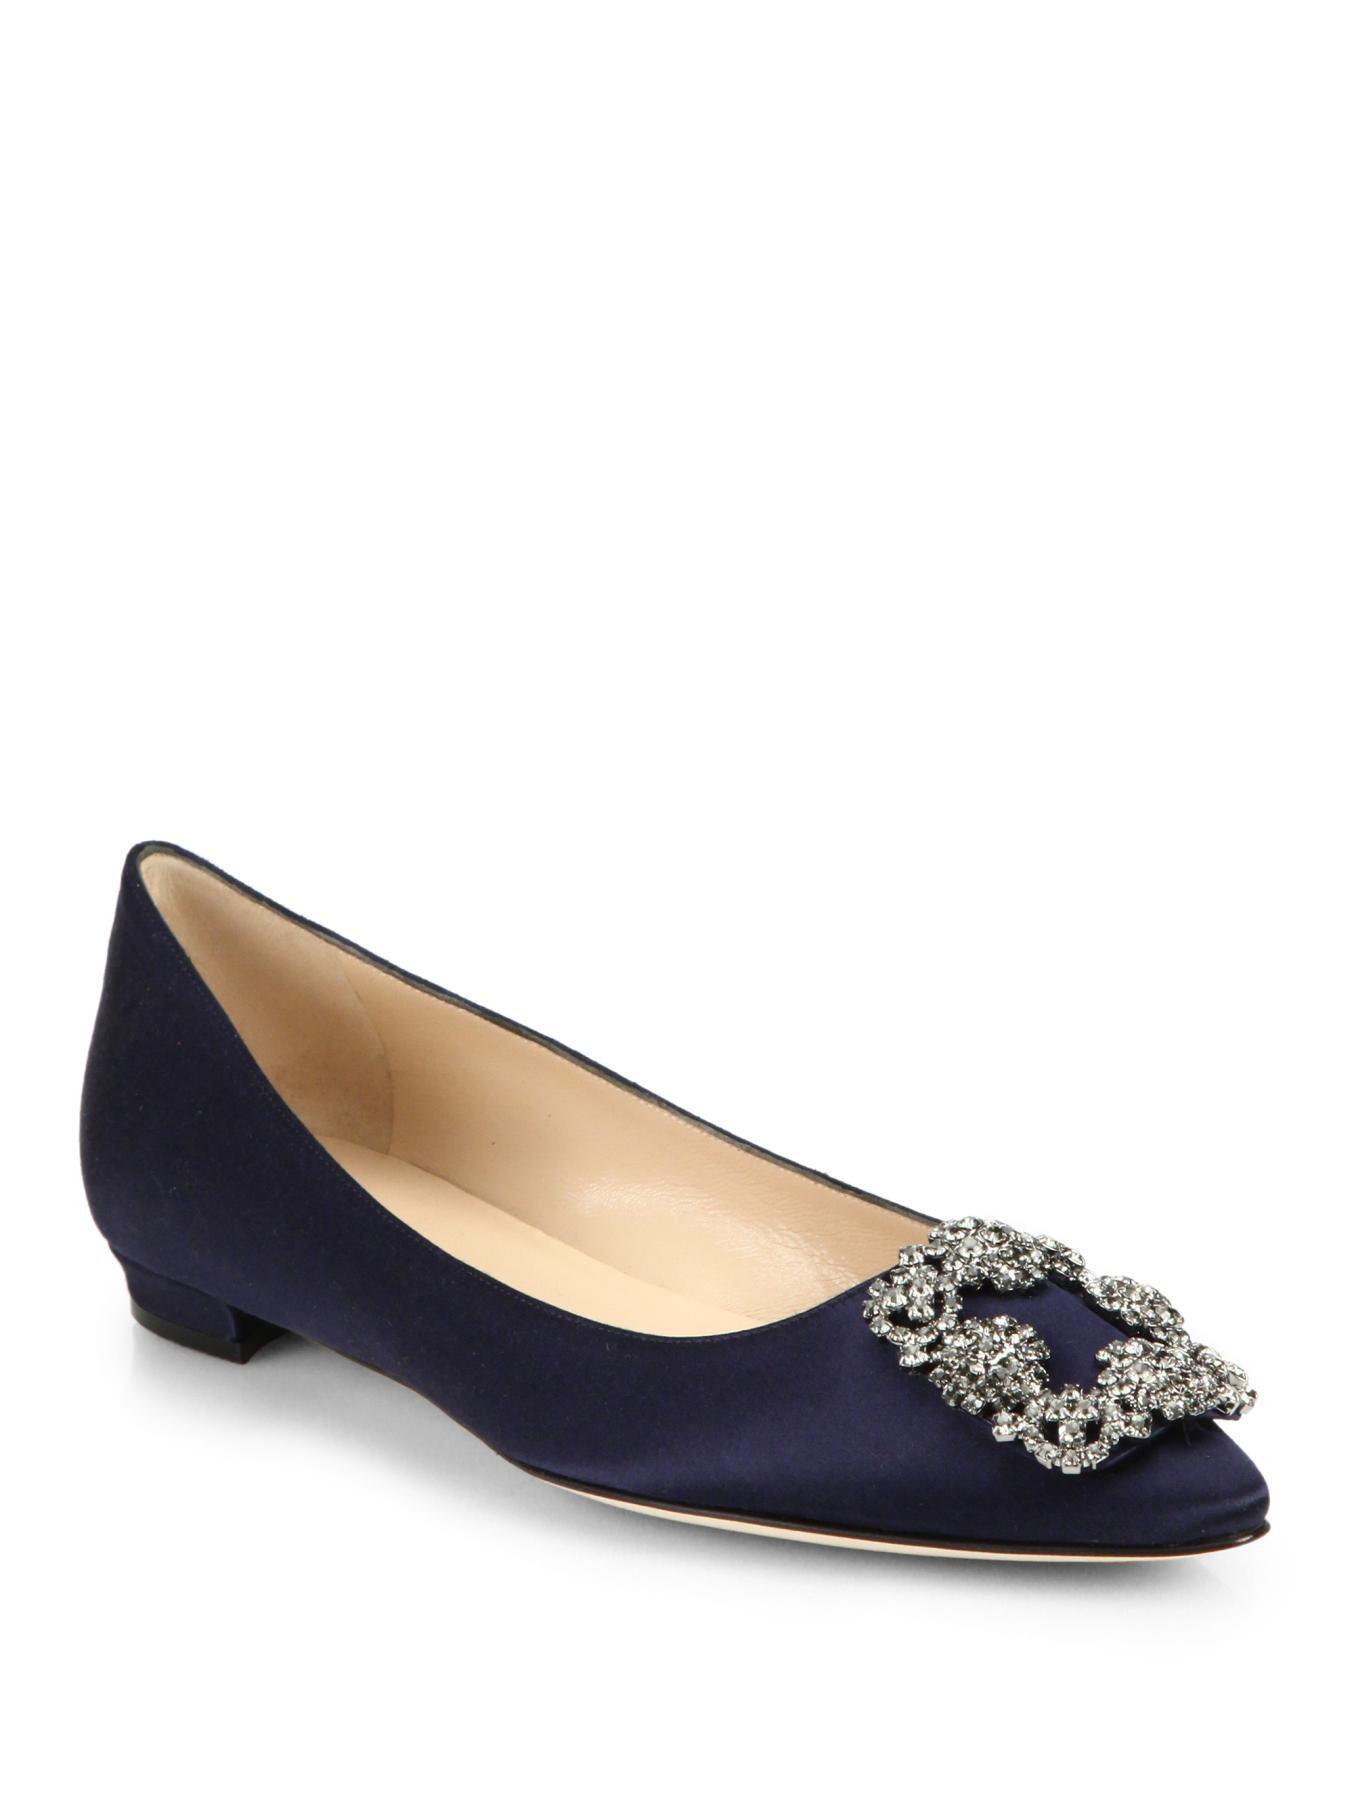 Bally Shoes Flats